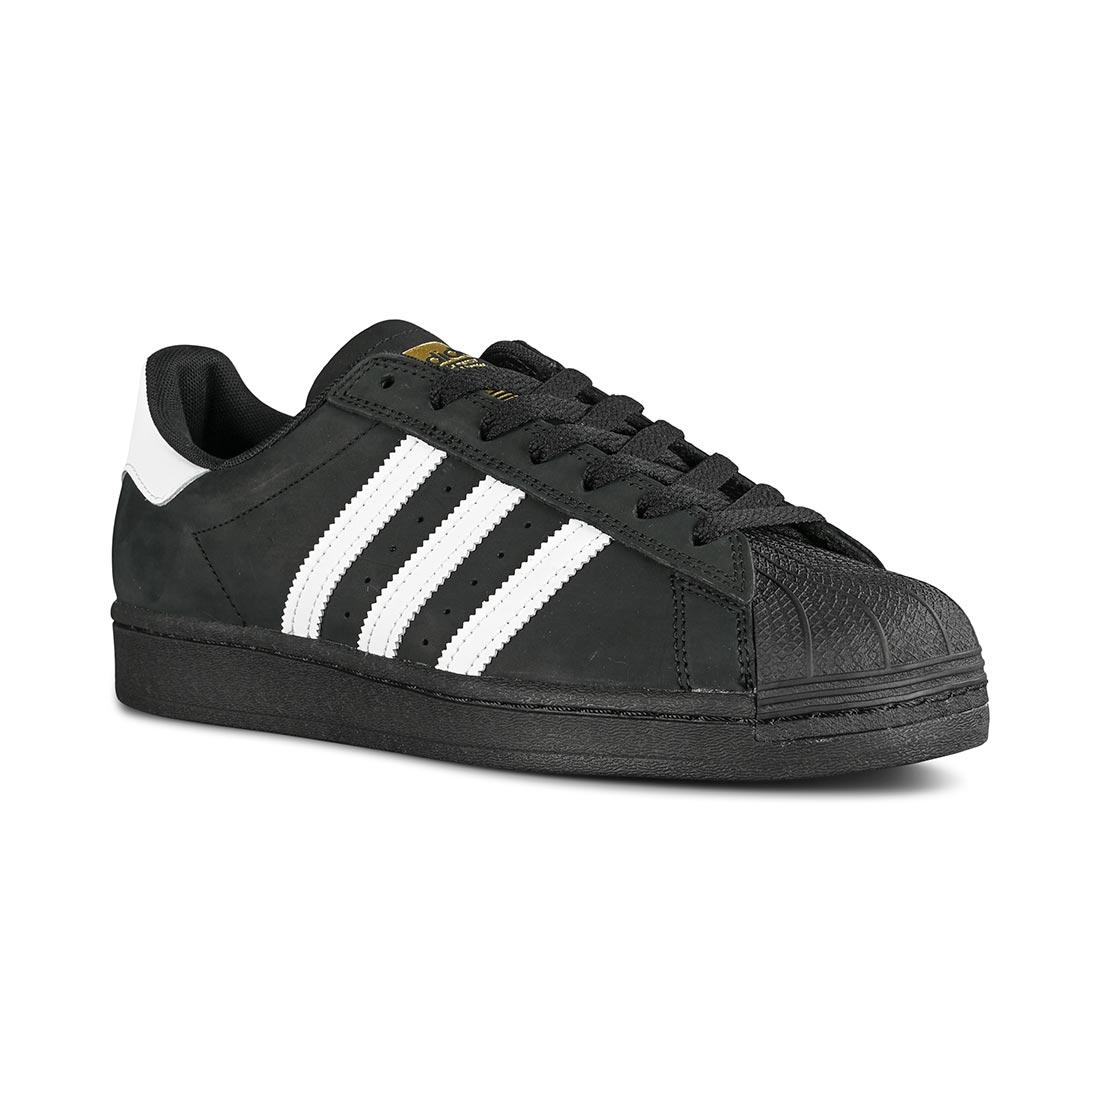 Adidas Superstar ADV Skate Shoes - Core